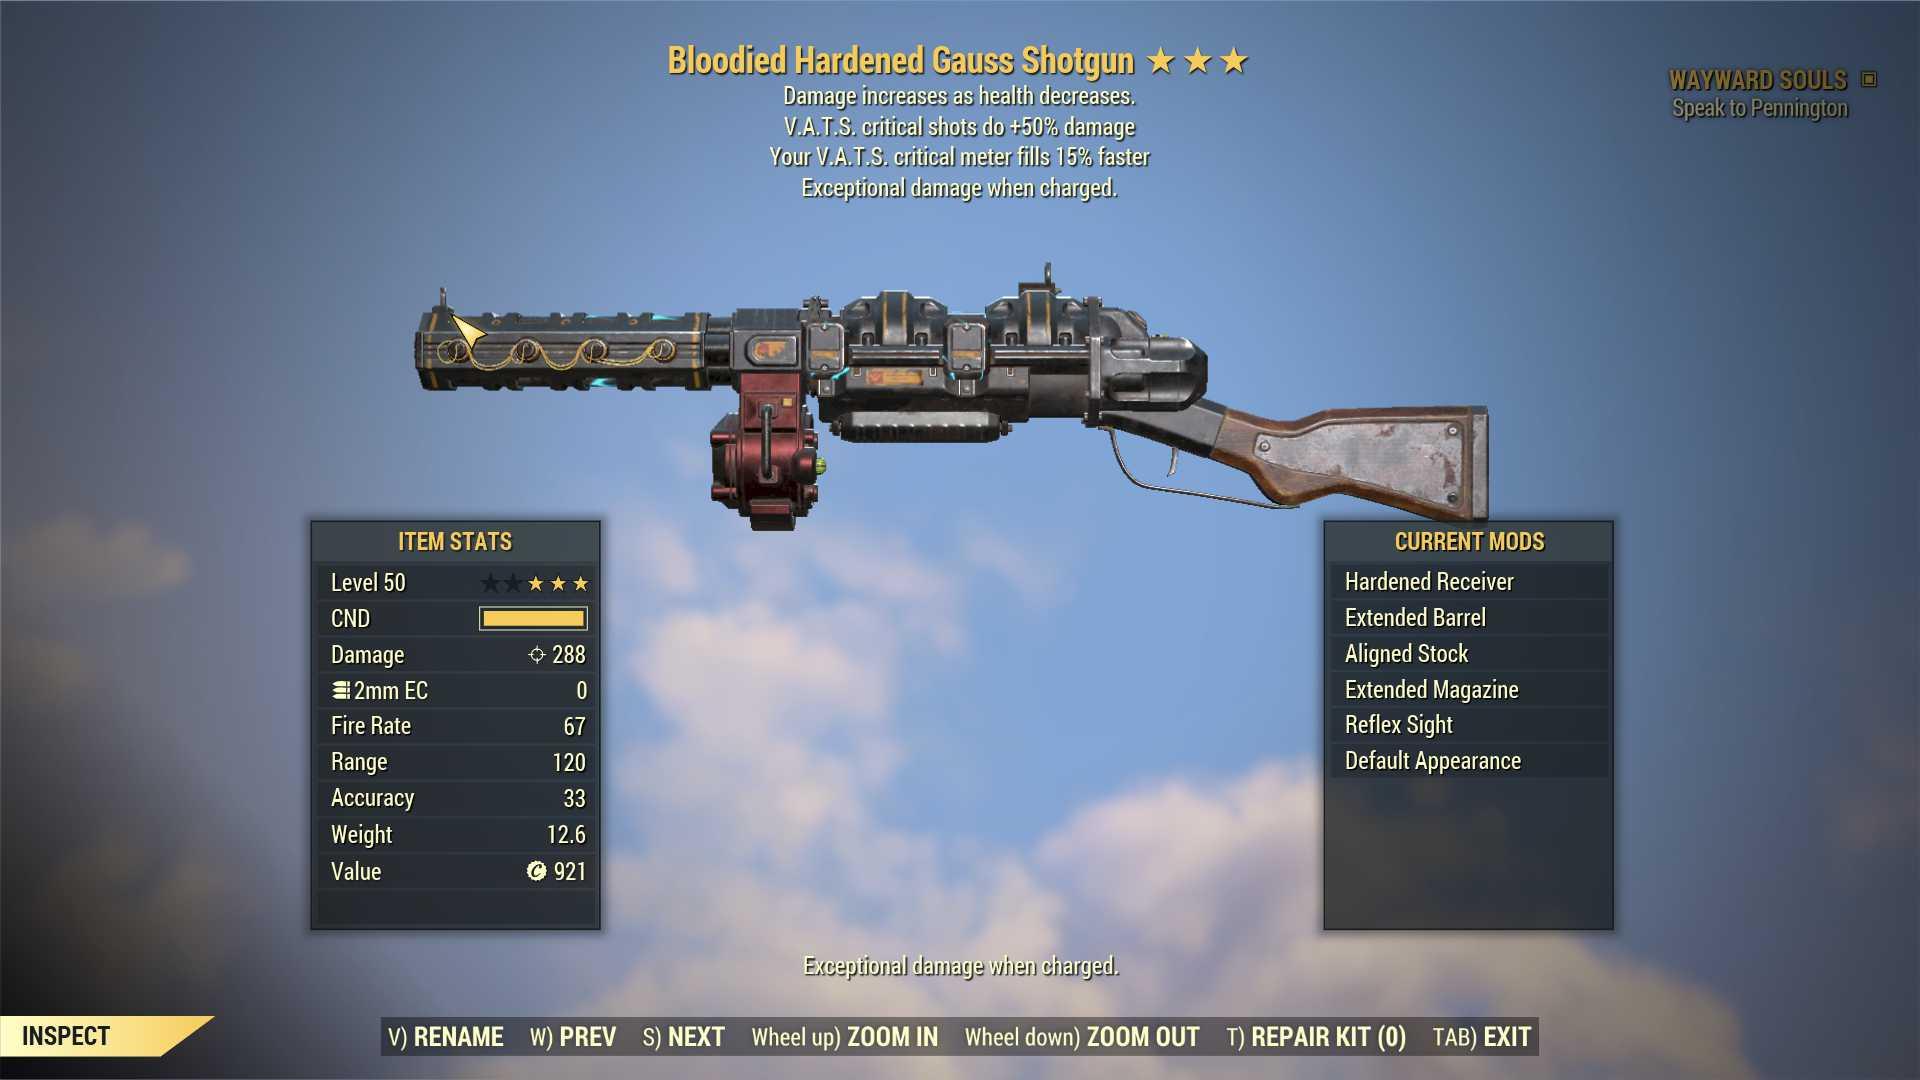 Bloodied Gauss Shotgun (+50% critical damage, VATS crit fills 15% faster) FULL MODDED [Wastelanders]